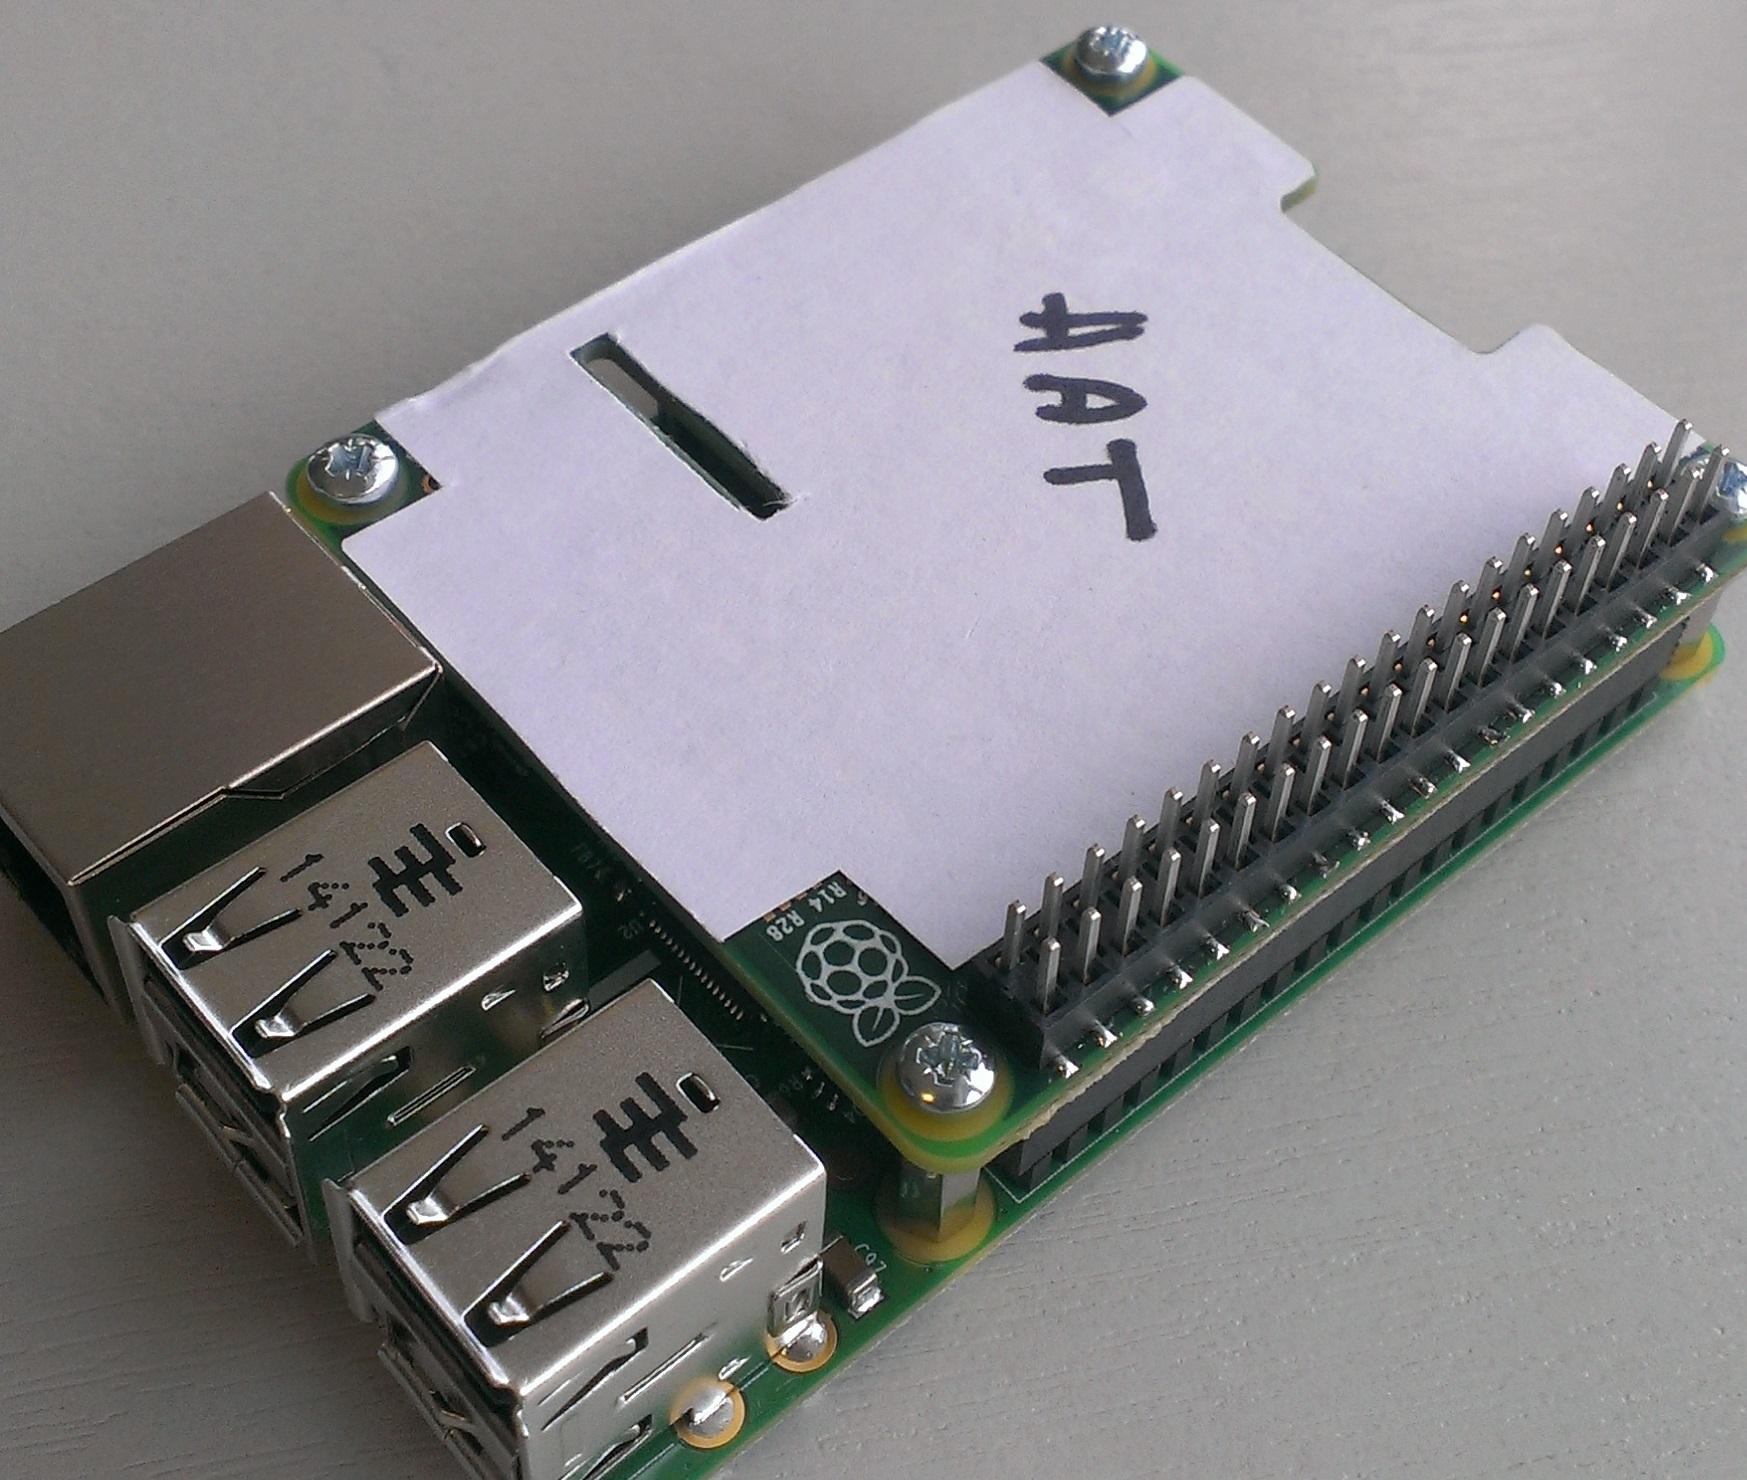 Разработчики Raspberry Pi представили новые спецификации плат расширения для Raspberry Pi B+